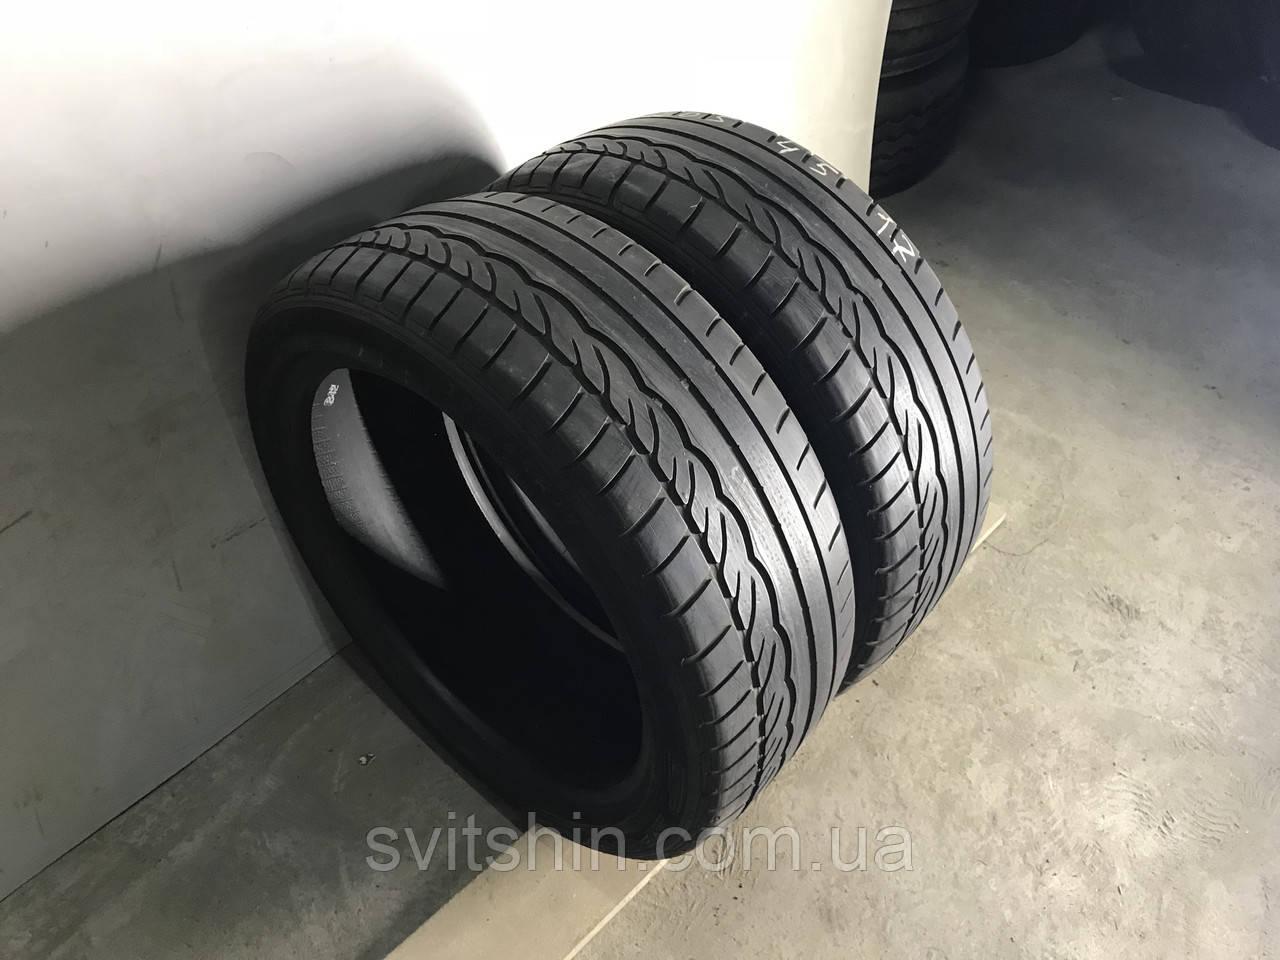 Шины бу лето 205/45R17 Dunlop SP Sport 01 пара 4мм